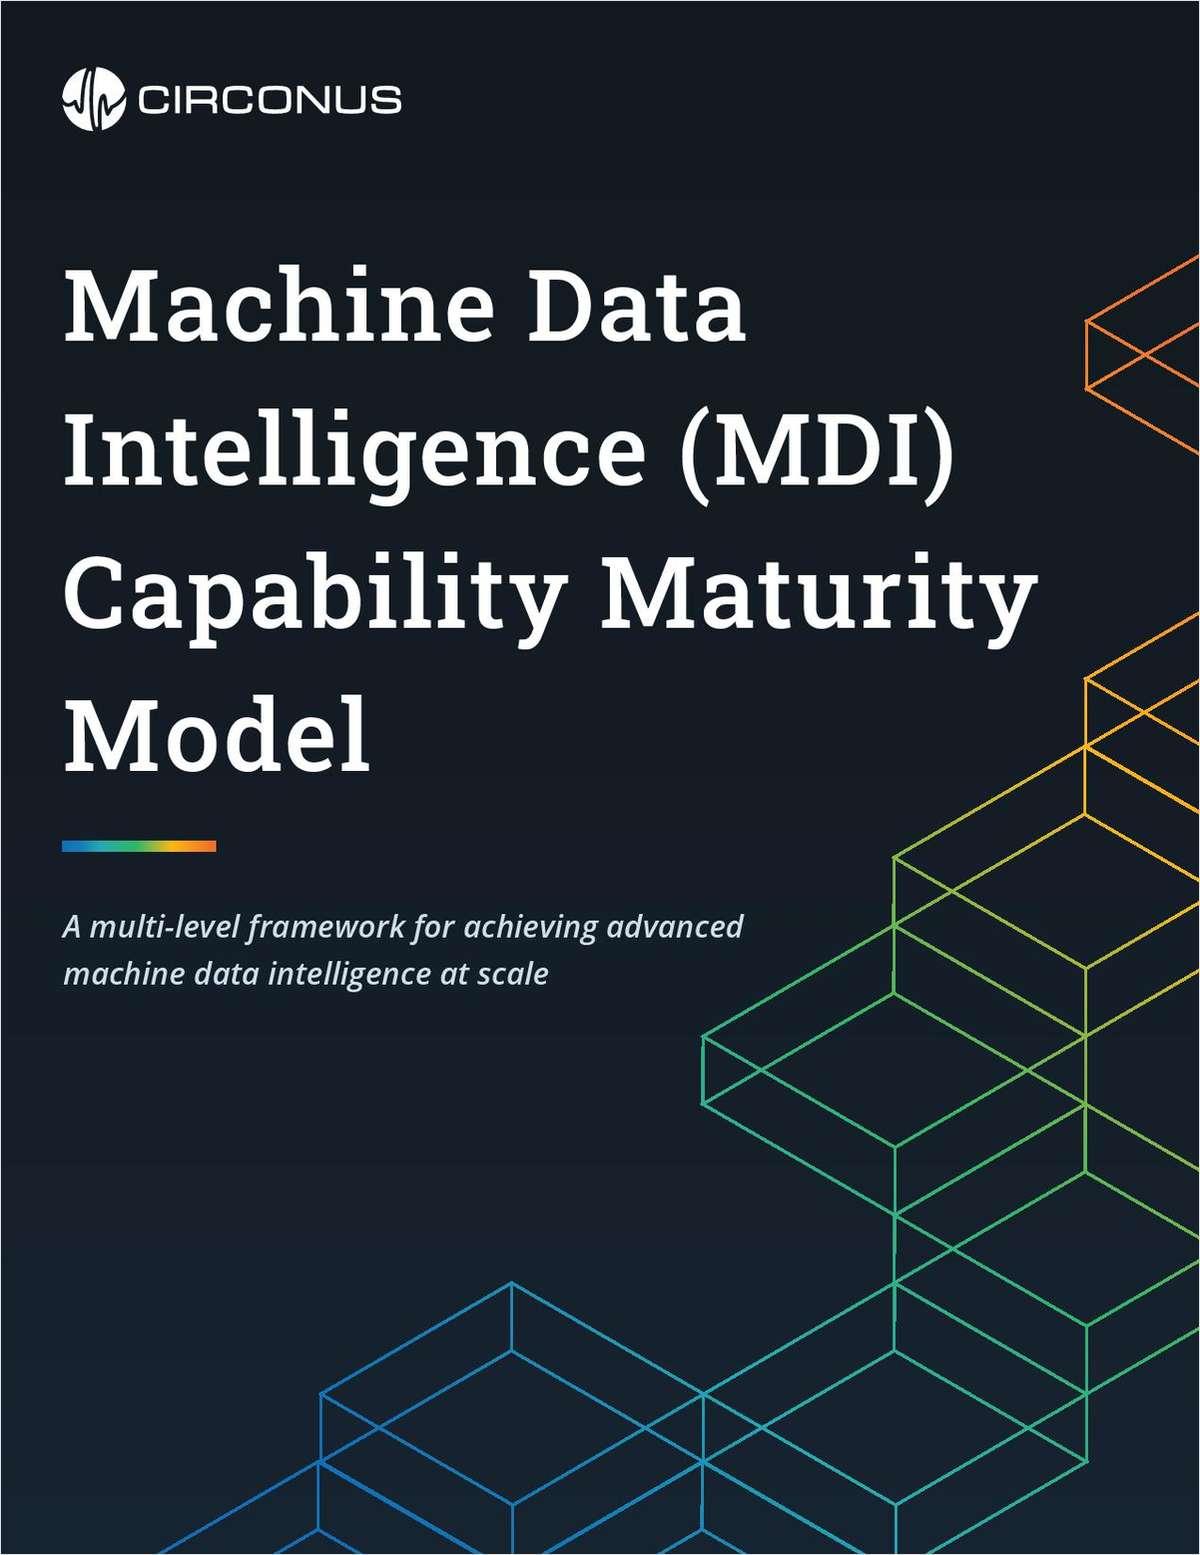 Machine Data Intelligence Capability Maturity Model